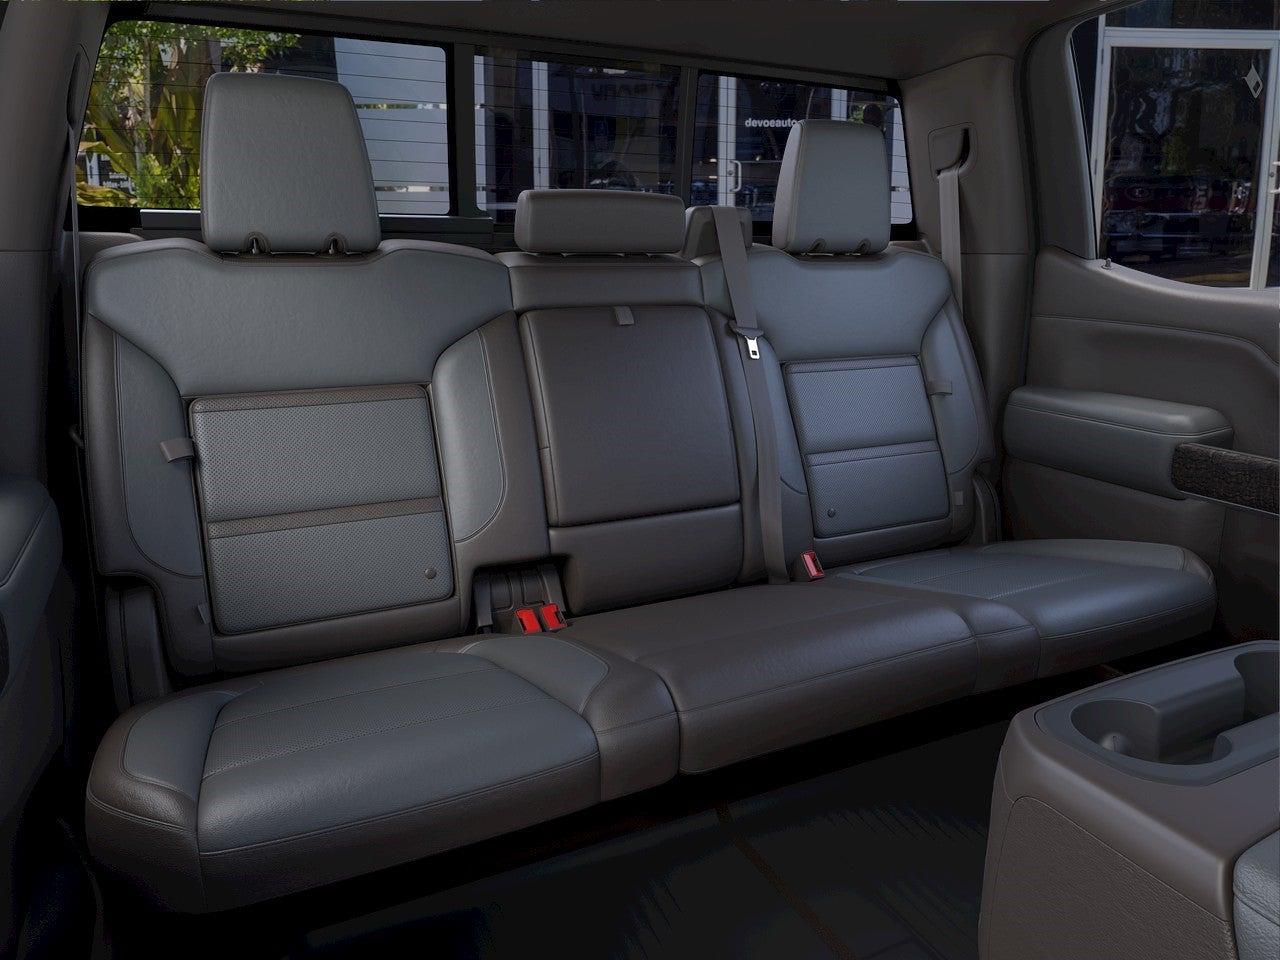 2021 GMC Sierra 1500 Crew Cab 4x4, Pickup #T21384 - photo 34